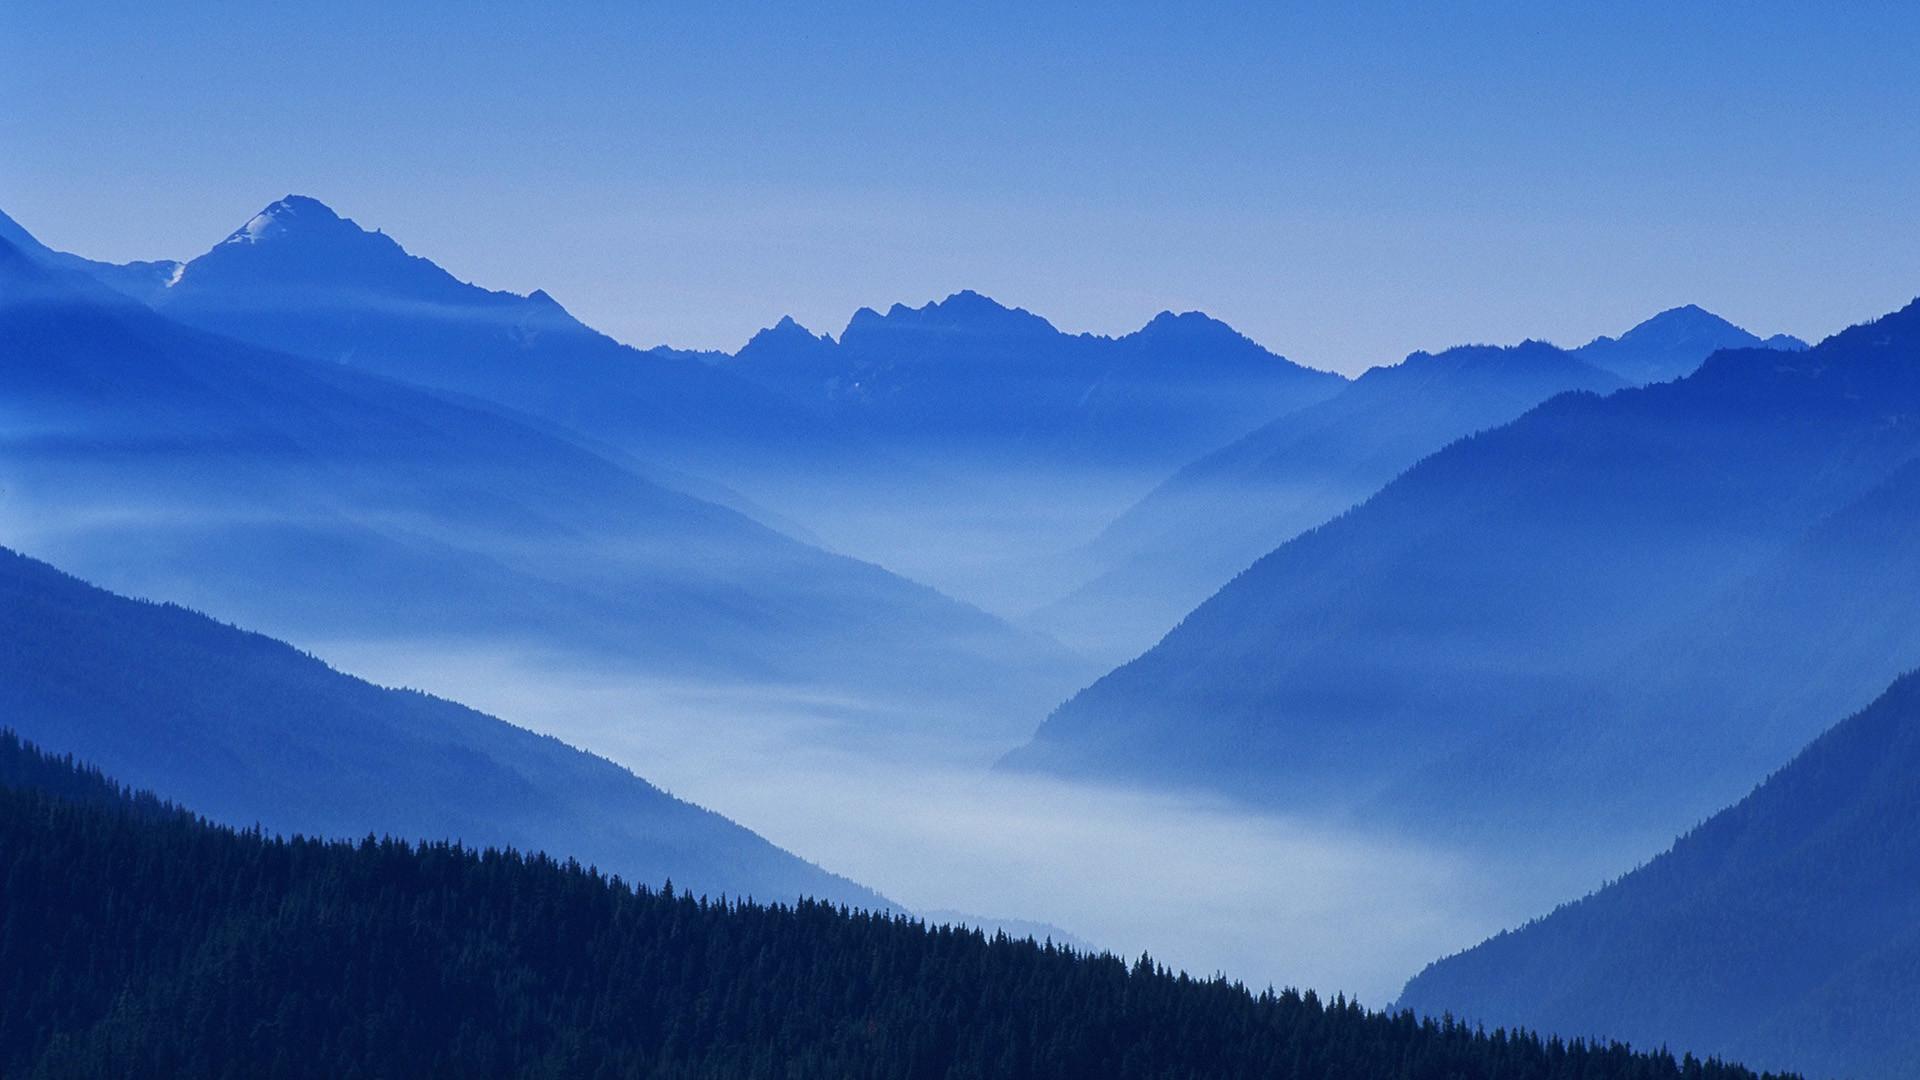 4K Mountain Wallpaper – WallpaperSafari